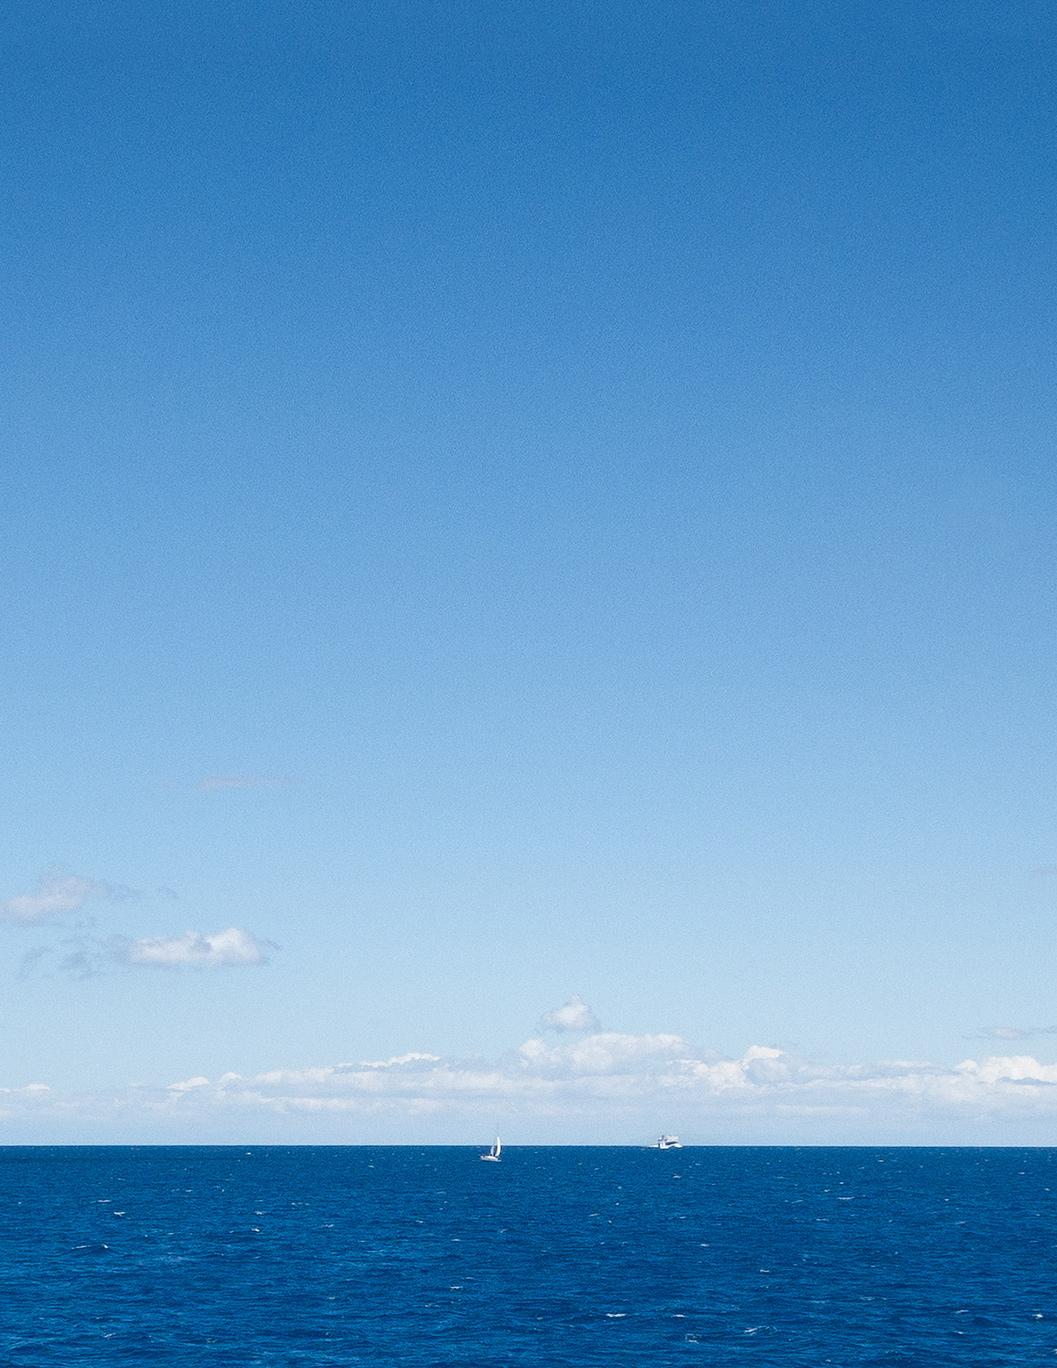 Blue Sky, Blue Sea